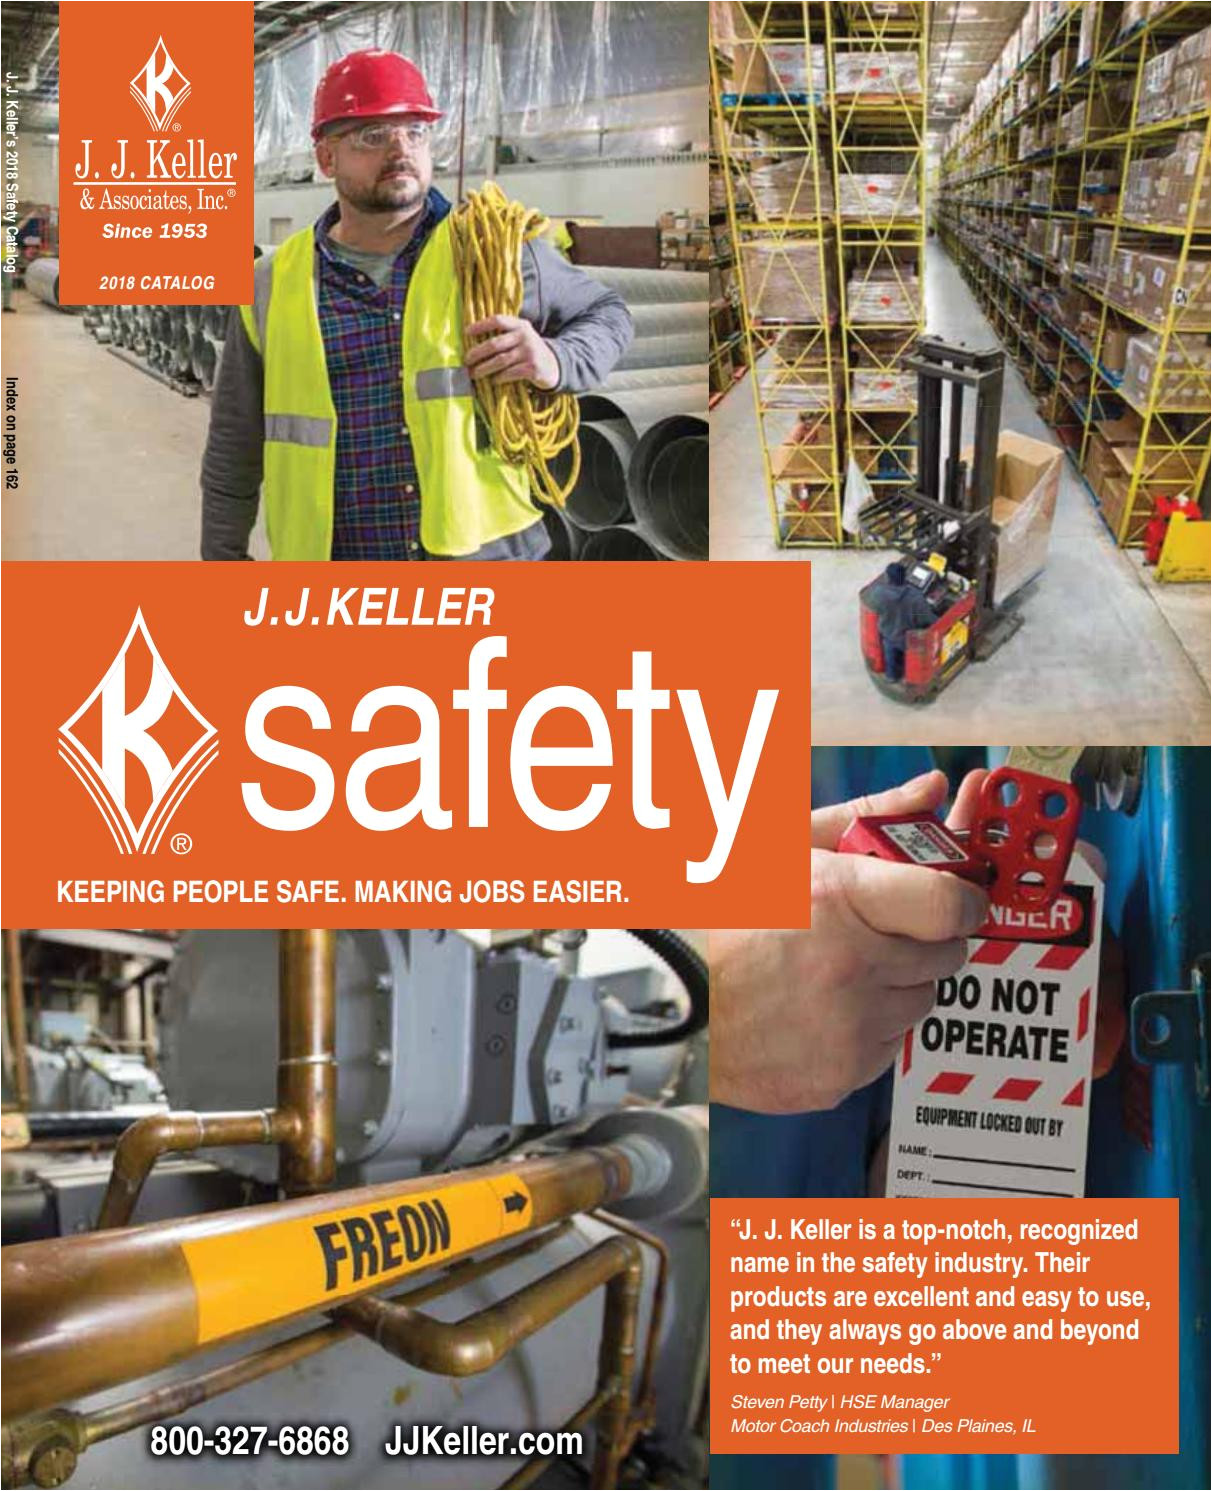 j j keller s 2018 safety catalog by j j keller associates inc issuu